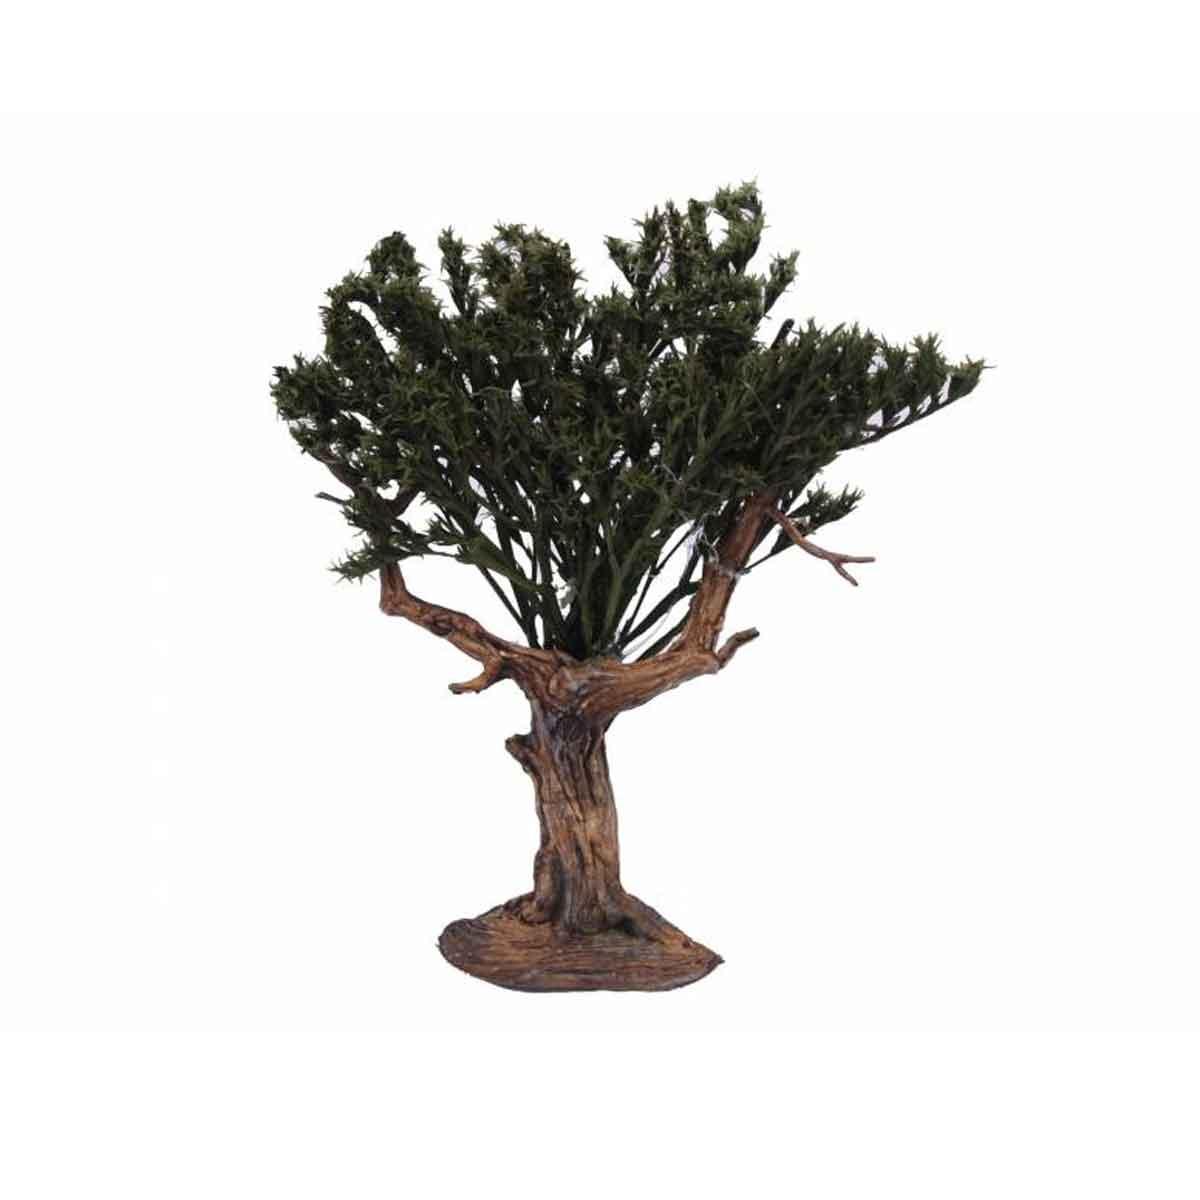 Presepe – Albero Foglie Verdi altezza 14cm